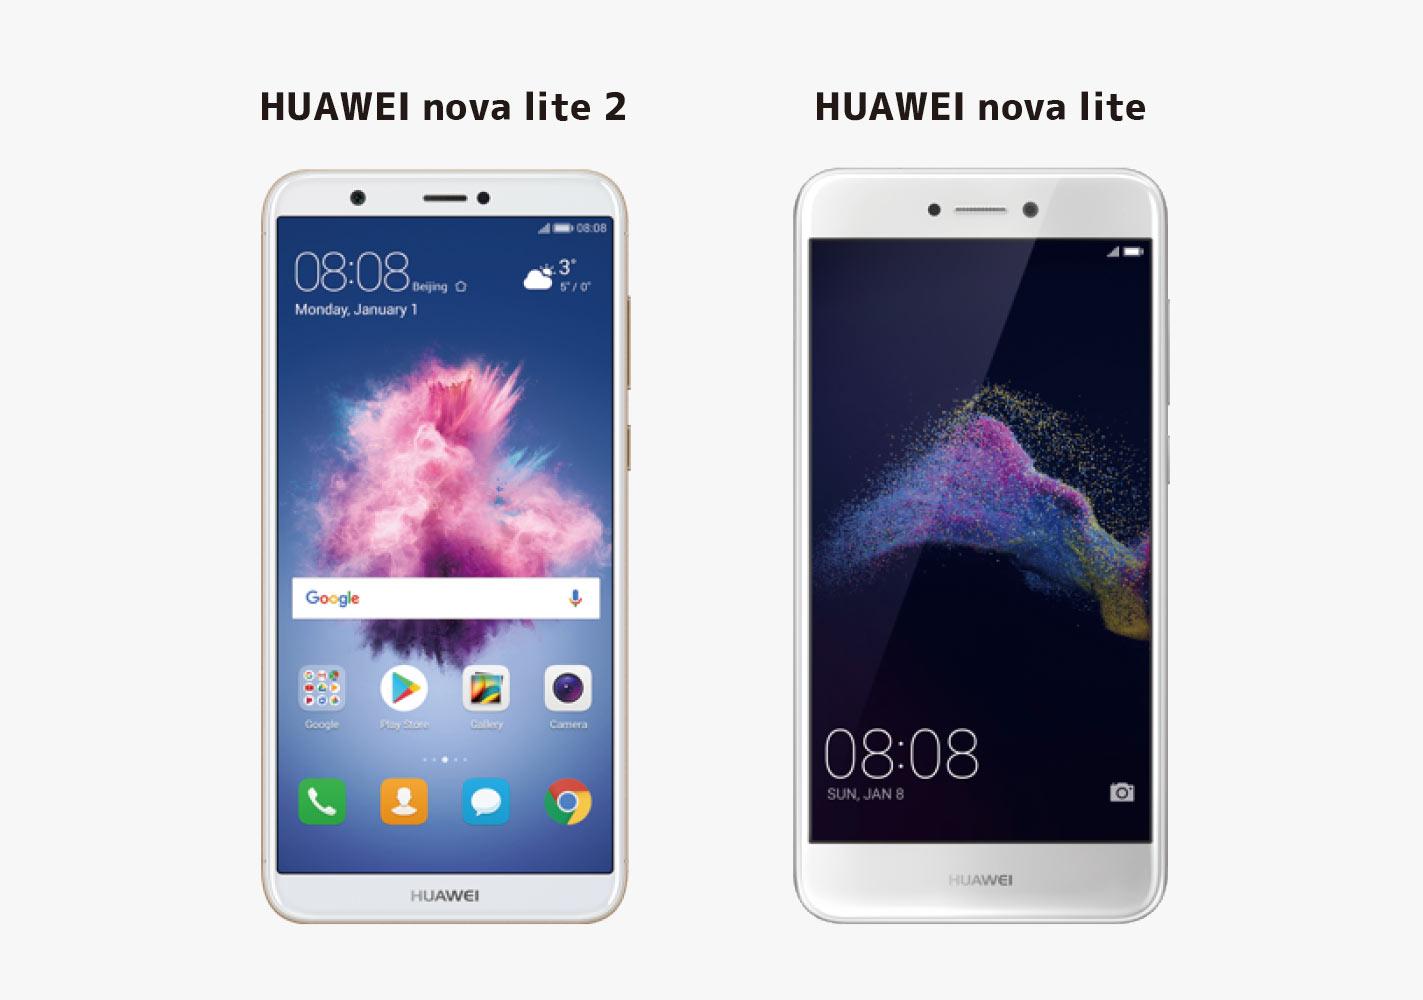 HUAWEI nova lite 2 vs nova lite 外観